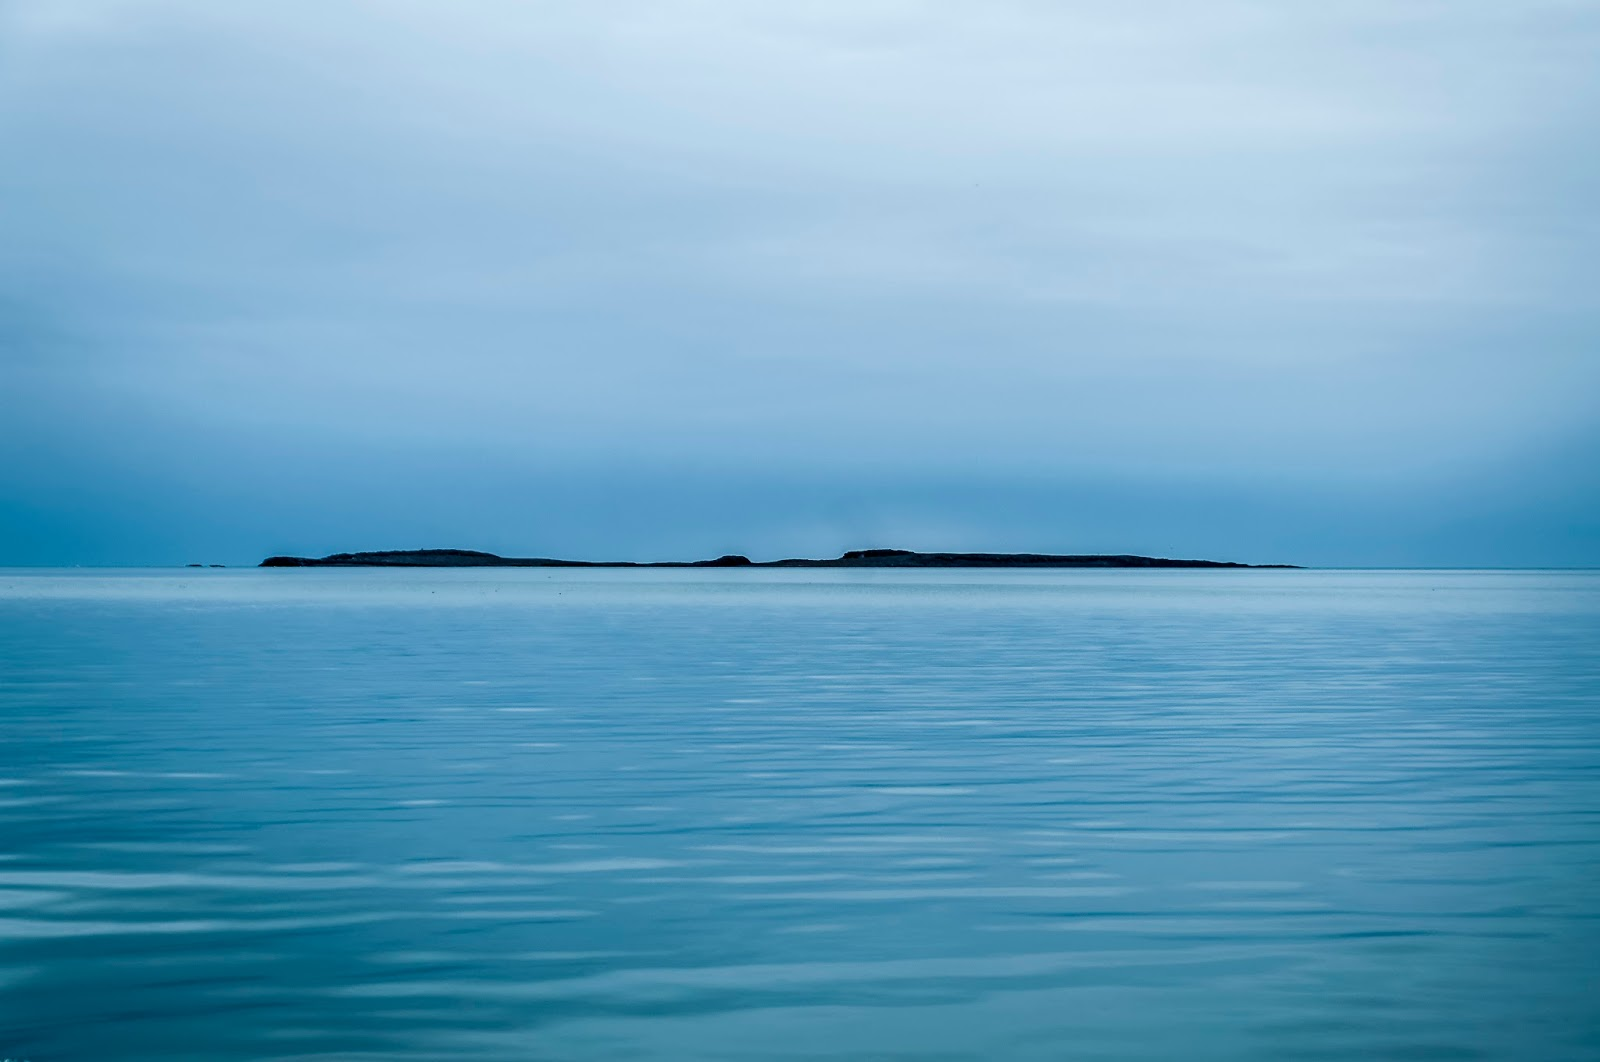 arctique svalbard spitzberg